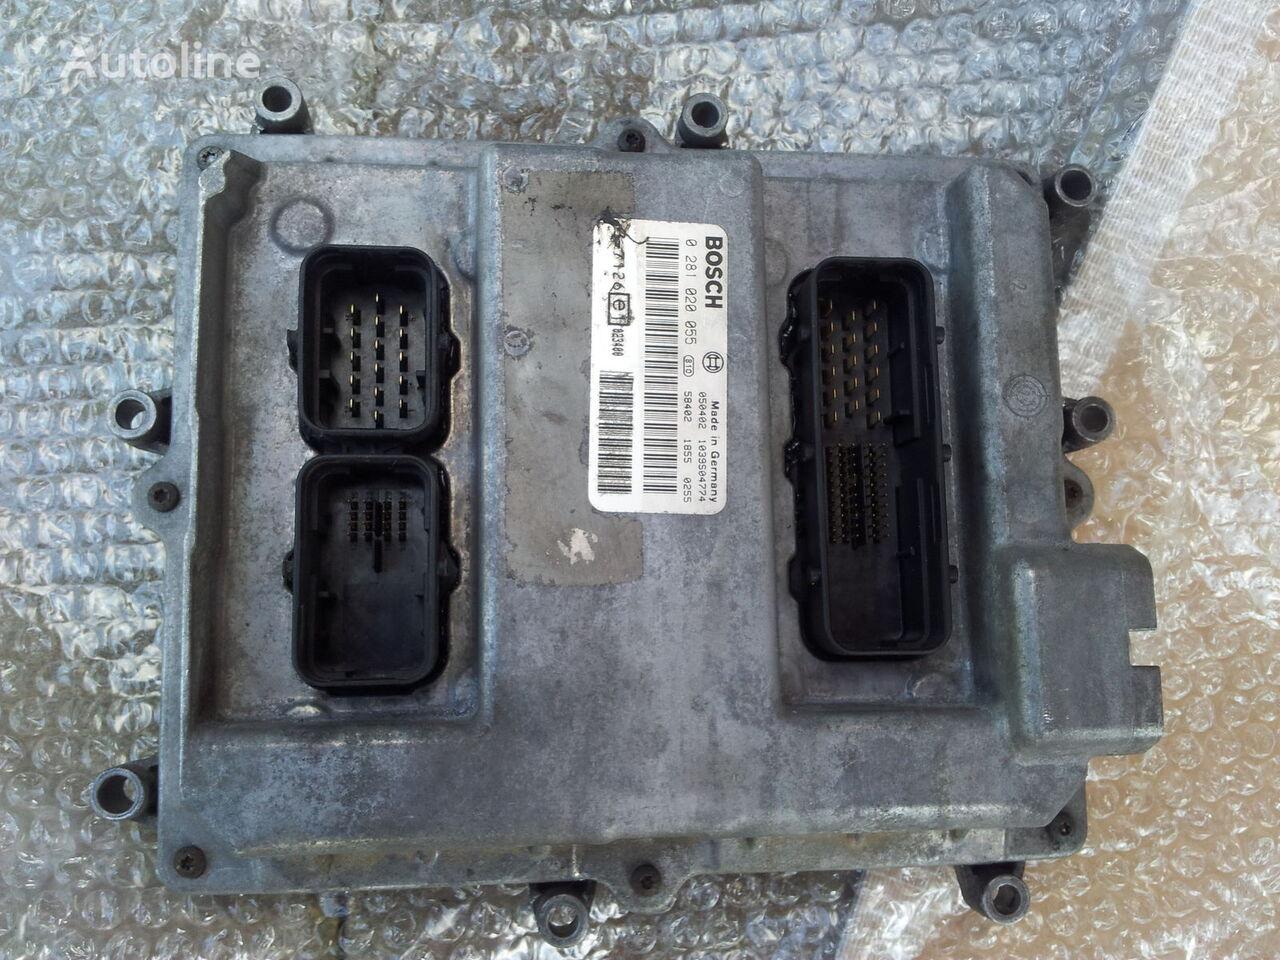 блок за управление  MAN Common Rail EDC, ECU electronic diesel control 0281020055, D2066LF01, 51258037126, 51258337169, 51258037127, 51258337168 за влекач MAN TGA